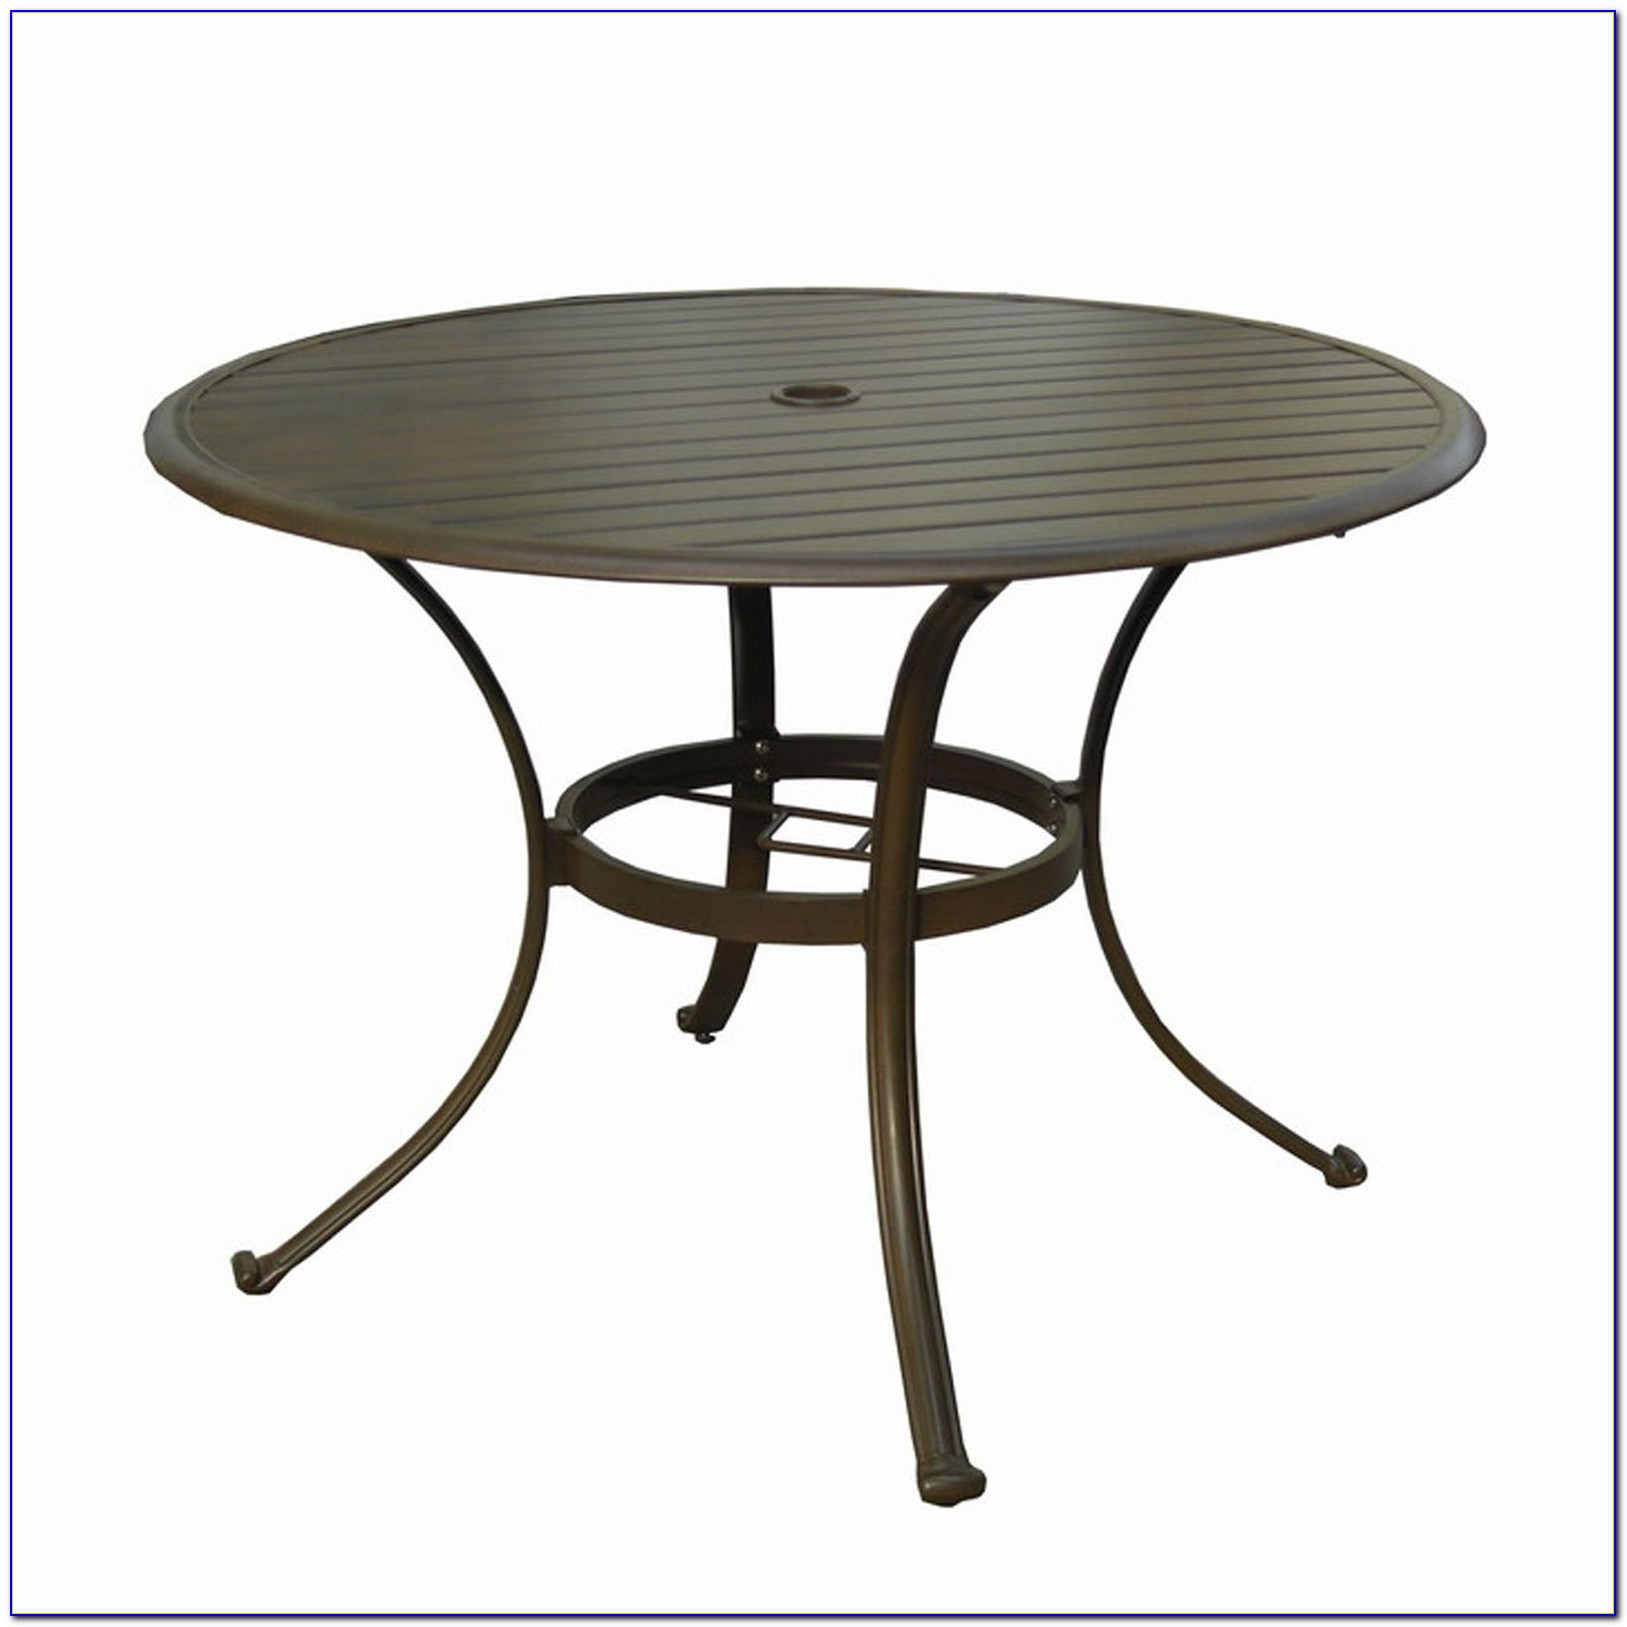 Patio Table With Umbrella Hole Uk